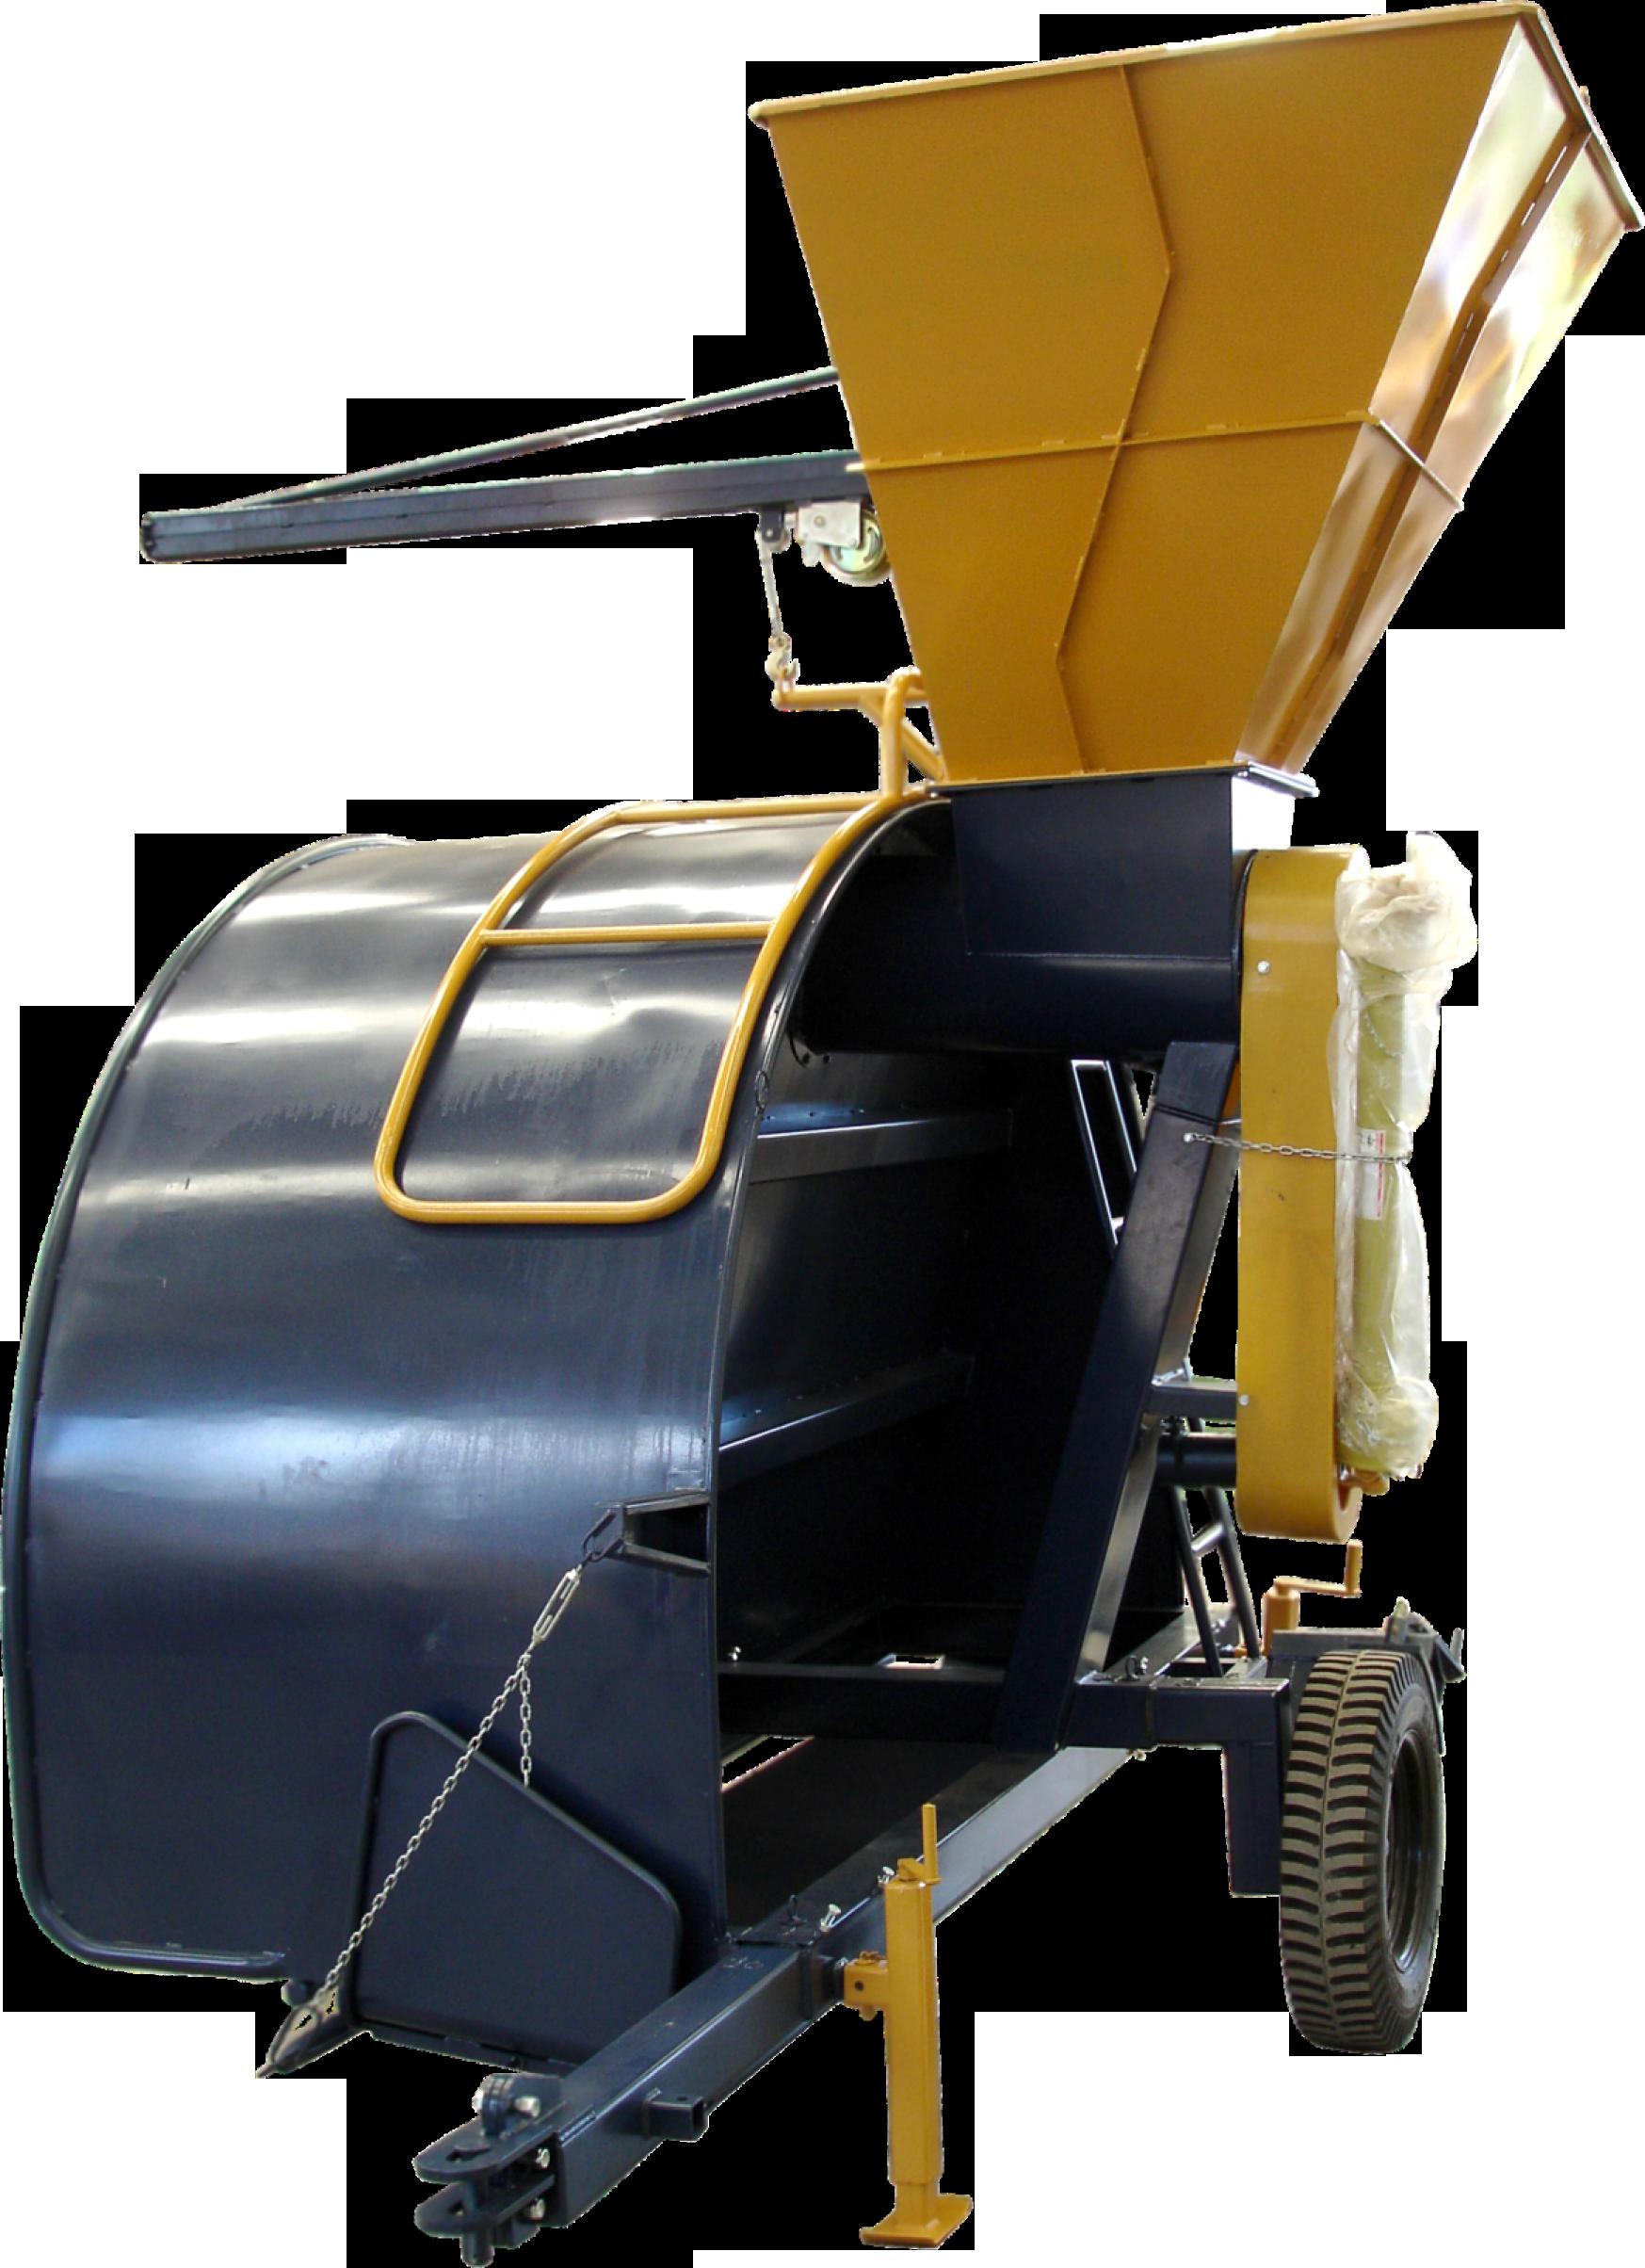 MecSilo: For storage of grains